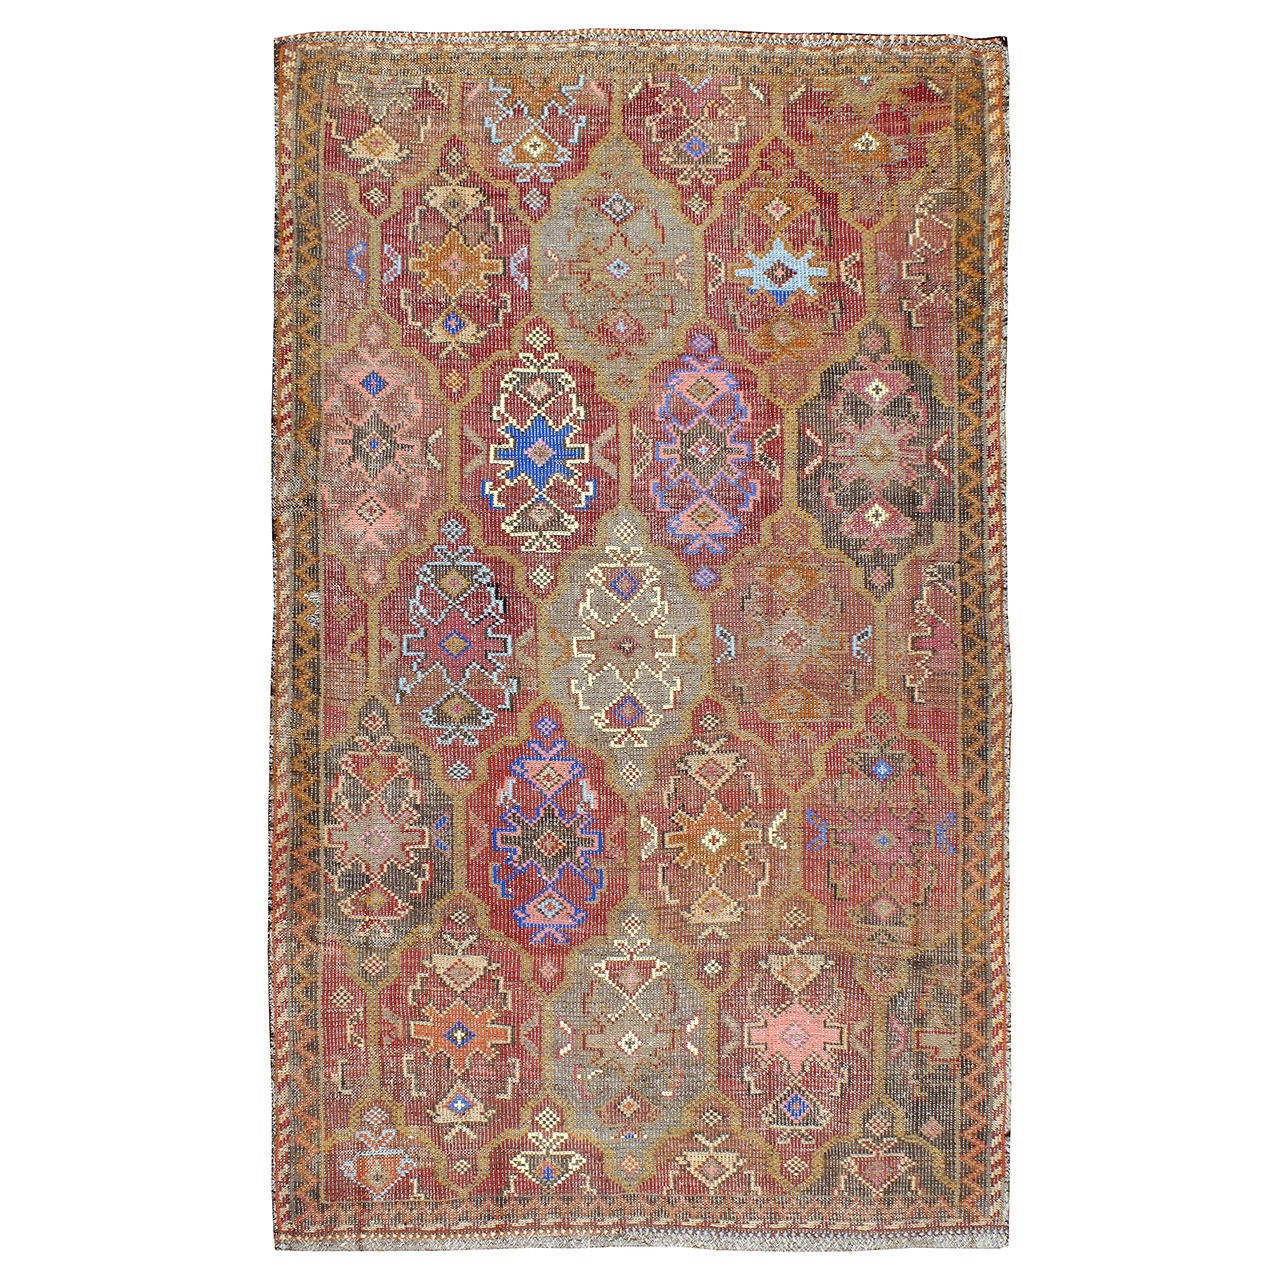 Vintage Turkish Flat Weave Rug: Vintage Flat-Weave Kilim Rug At 1stdibs